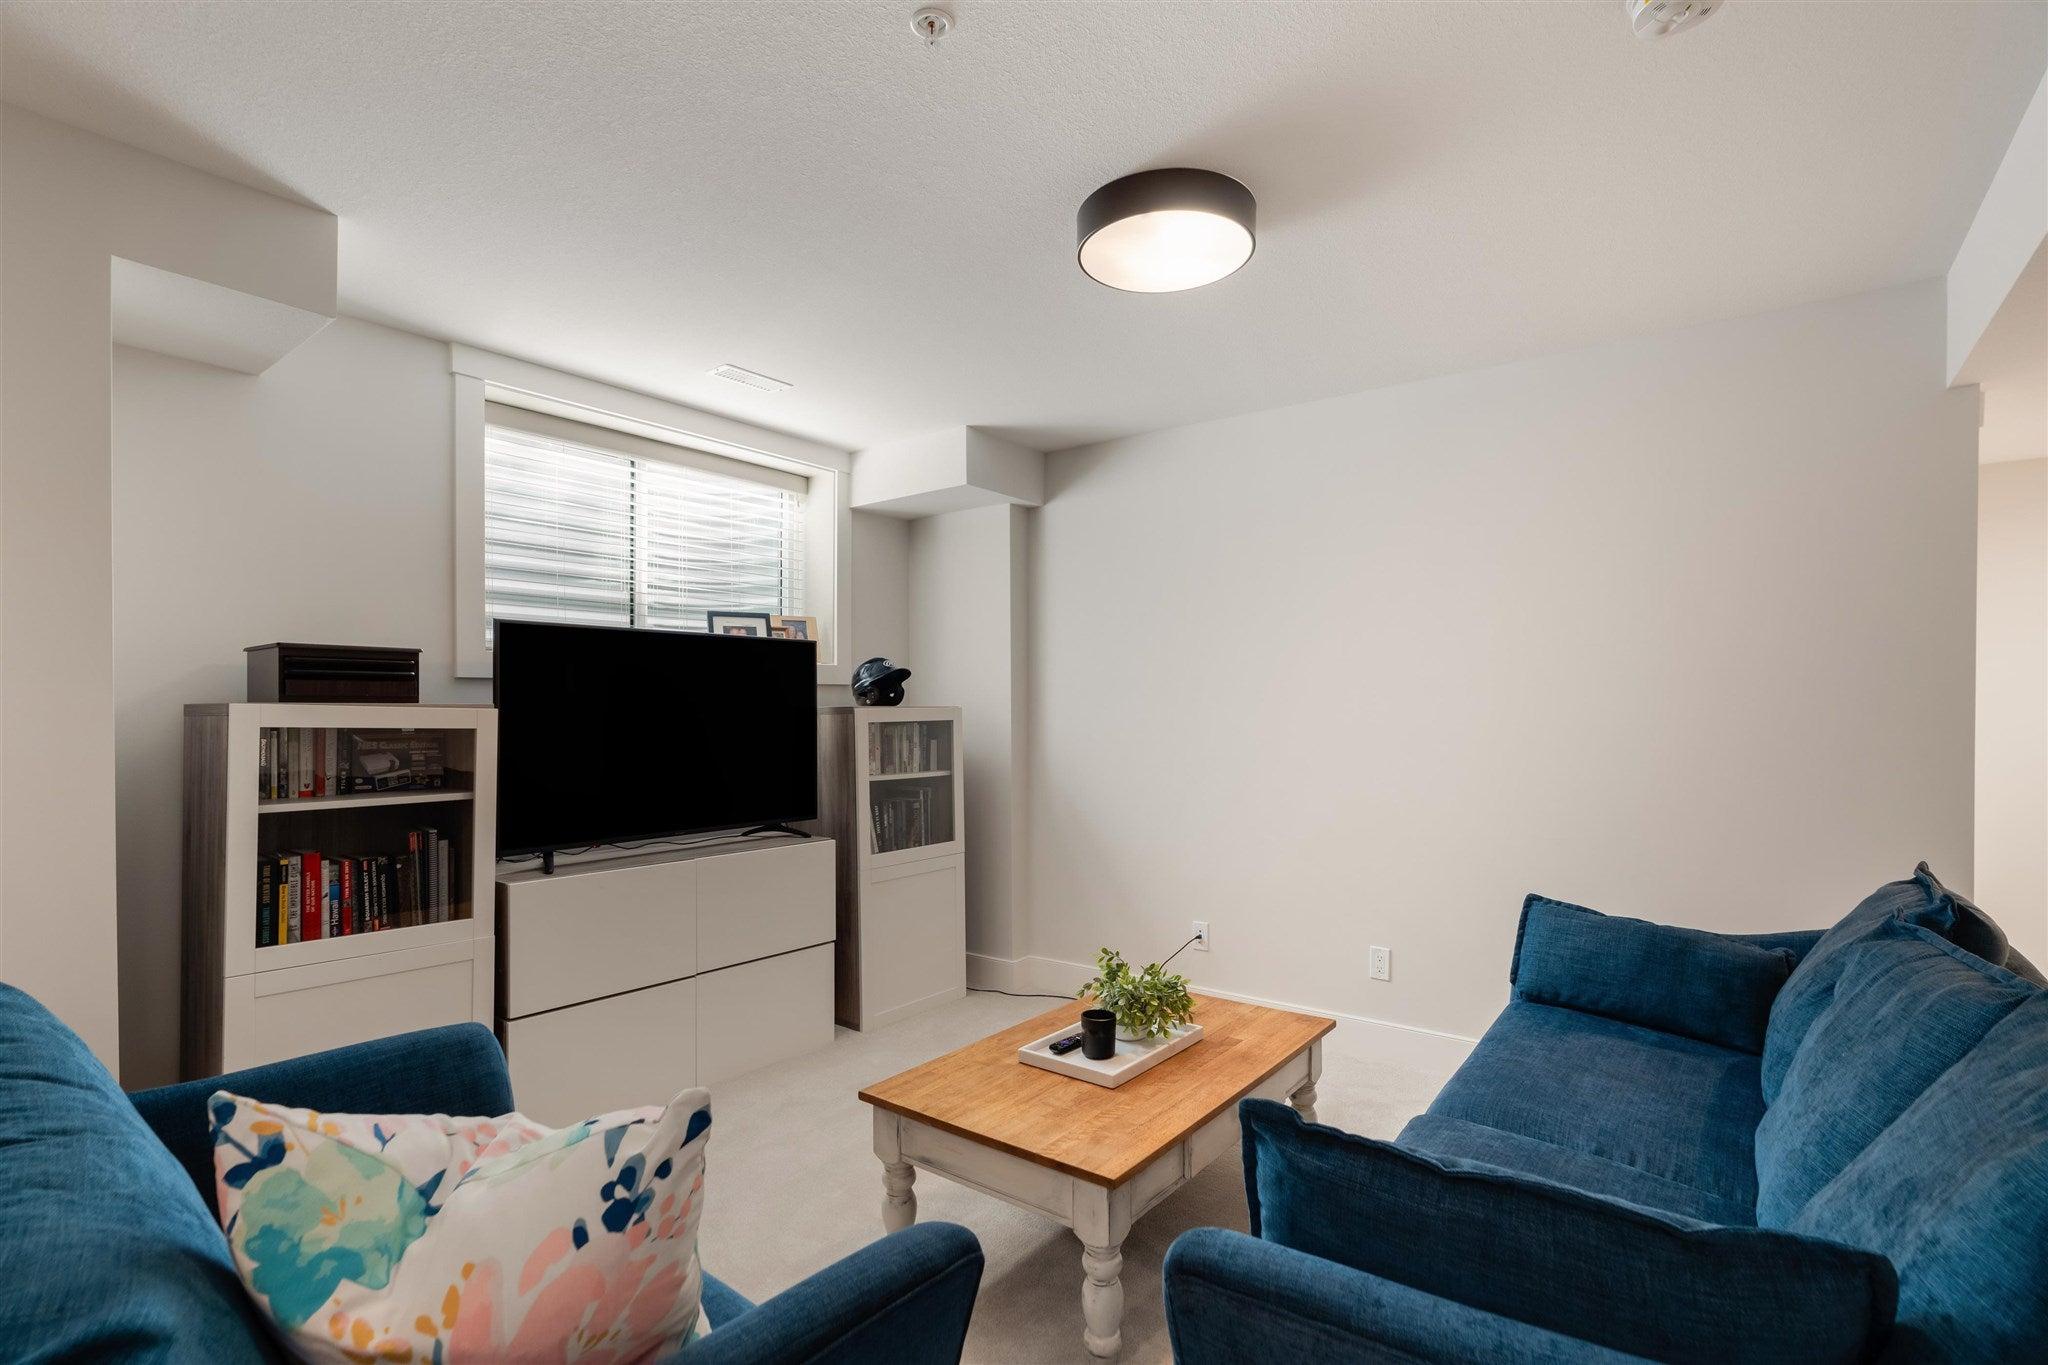 40 21858 47B AVENUE - Murrayville Townhouse for sale, 4 Bedrooms (R2603956) - #28